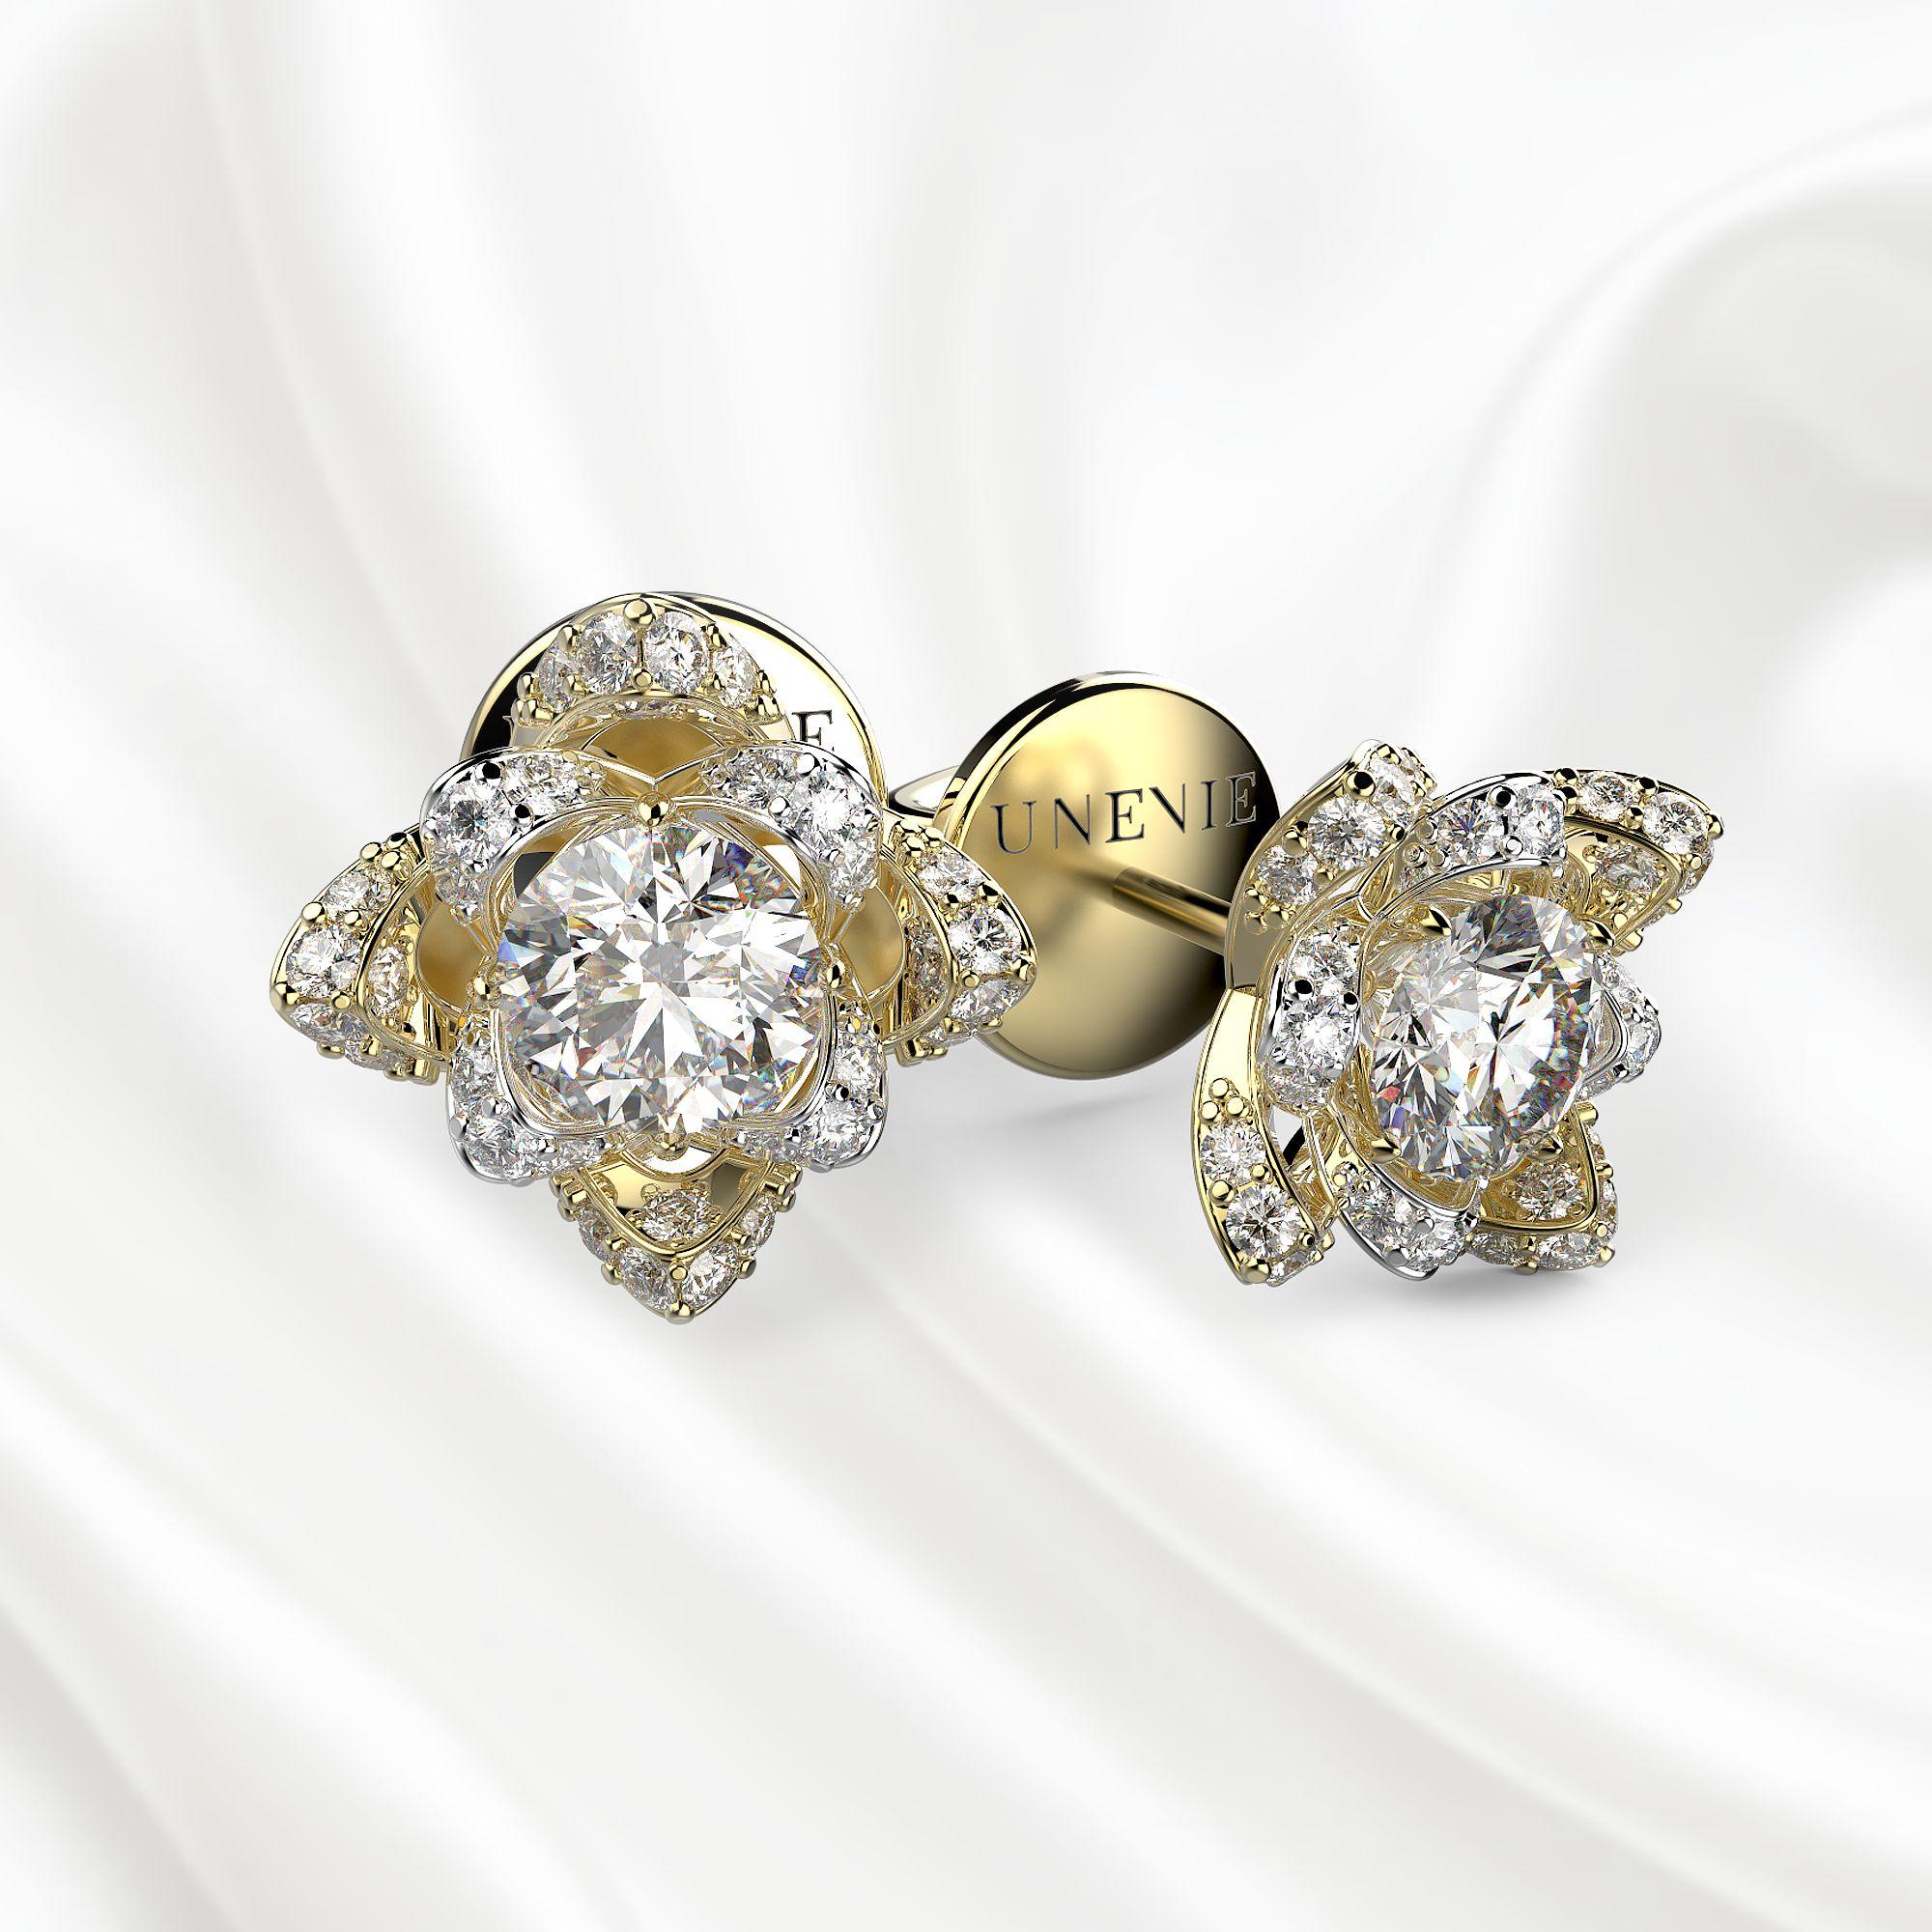 S5 Серьги из желто-белого золота с 34 бриллиантами 0.86 карат